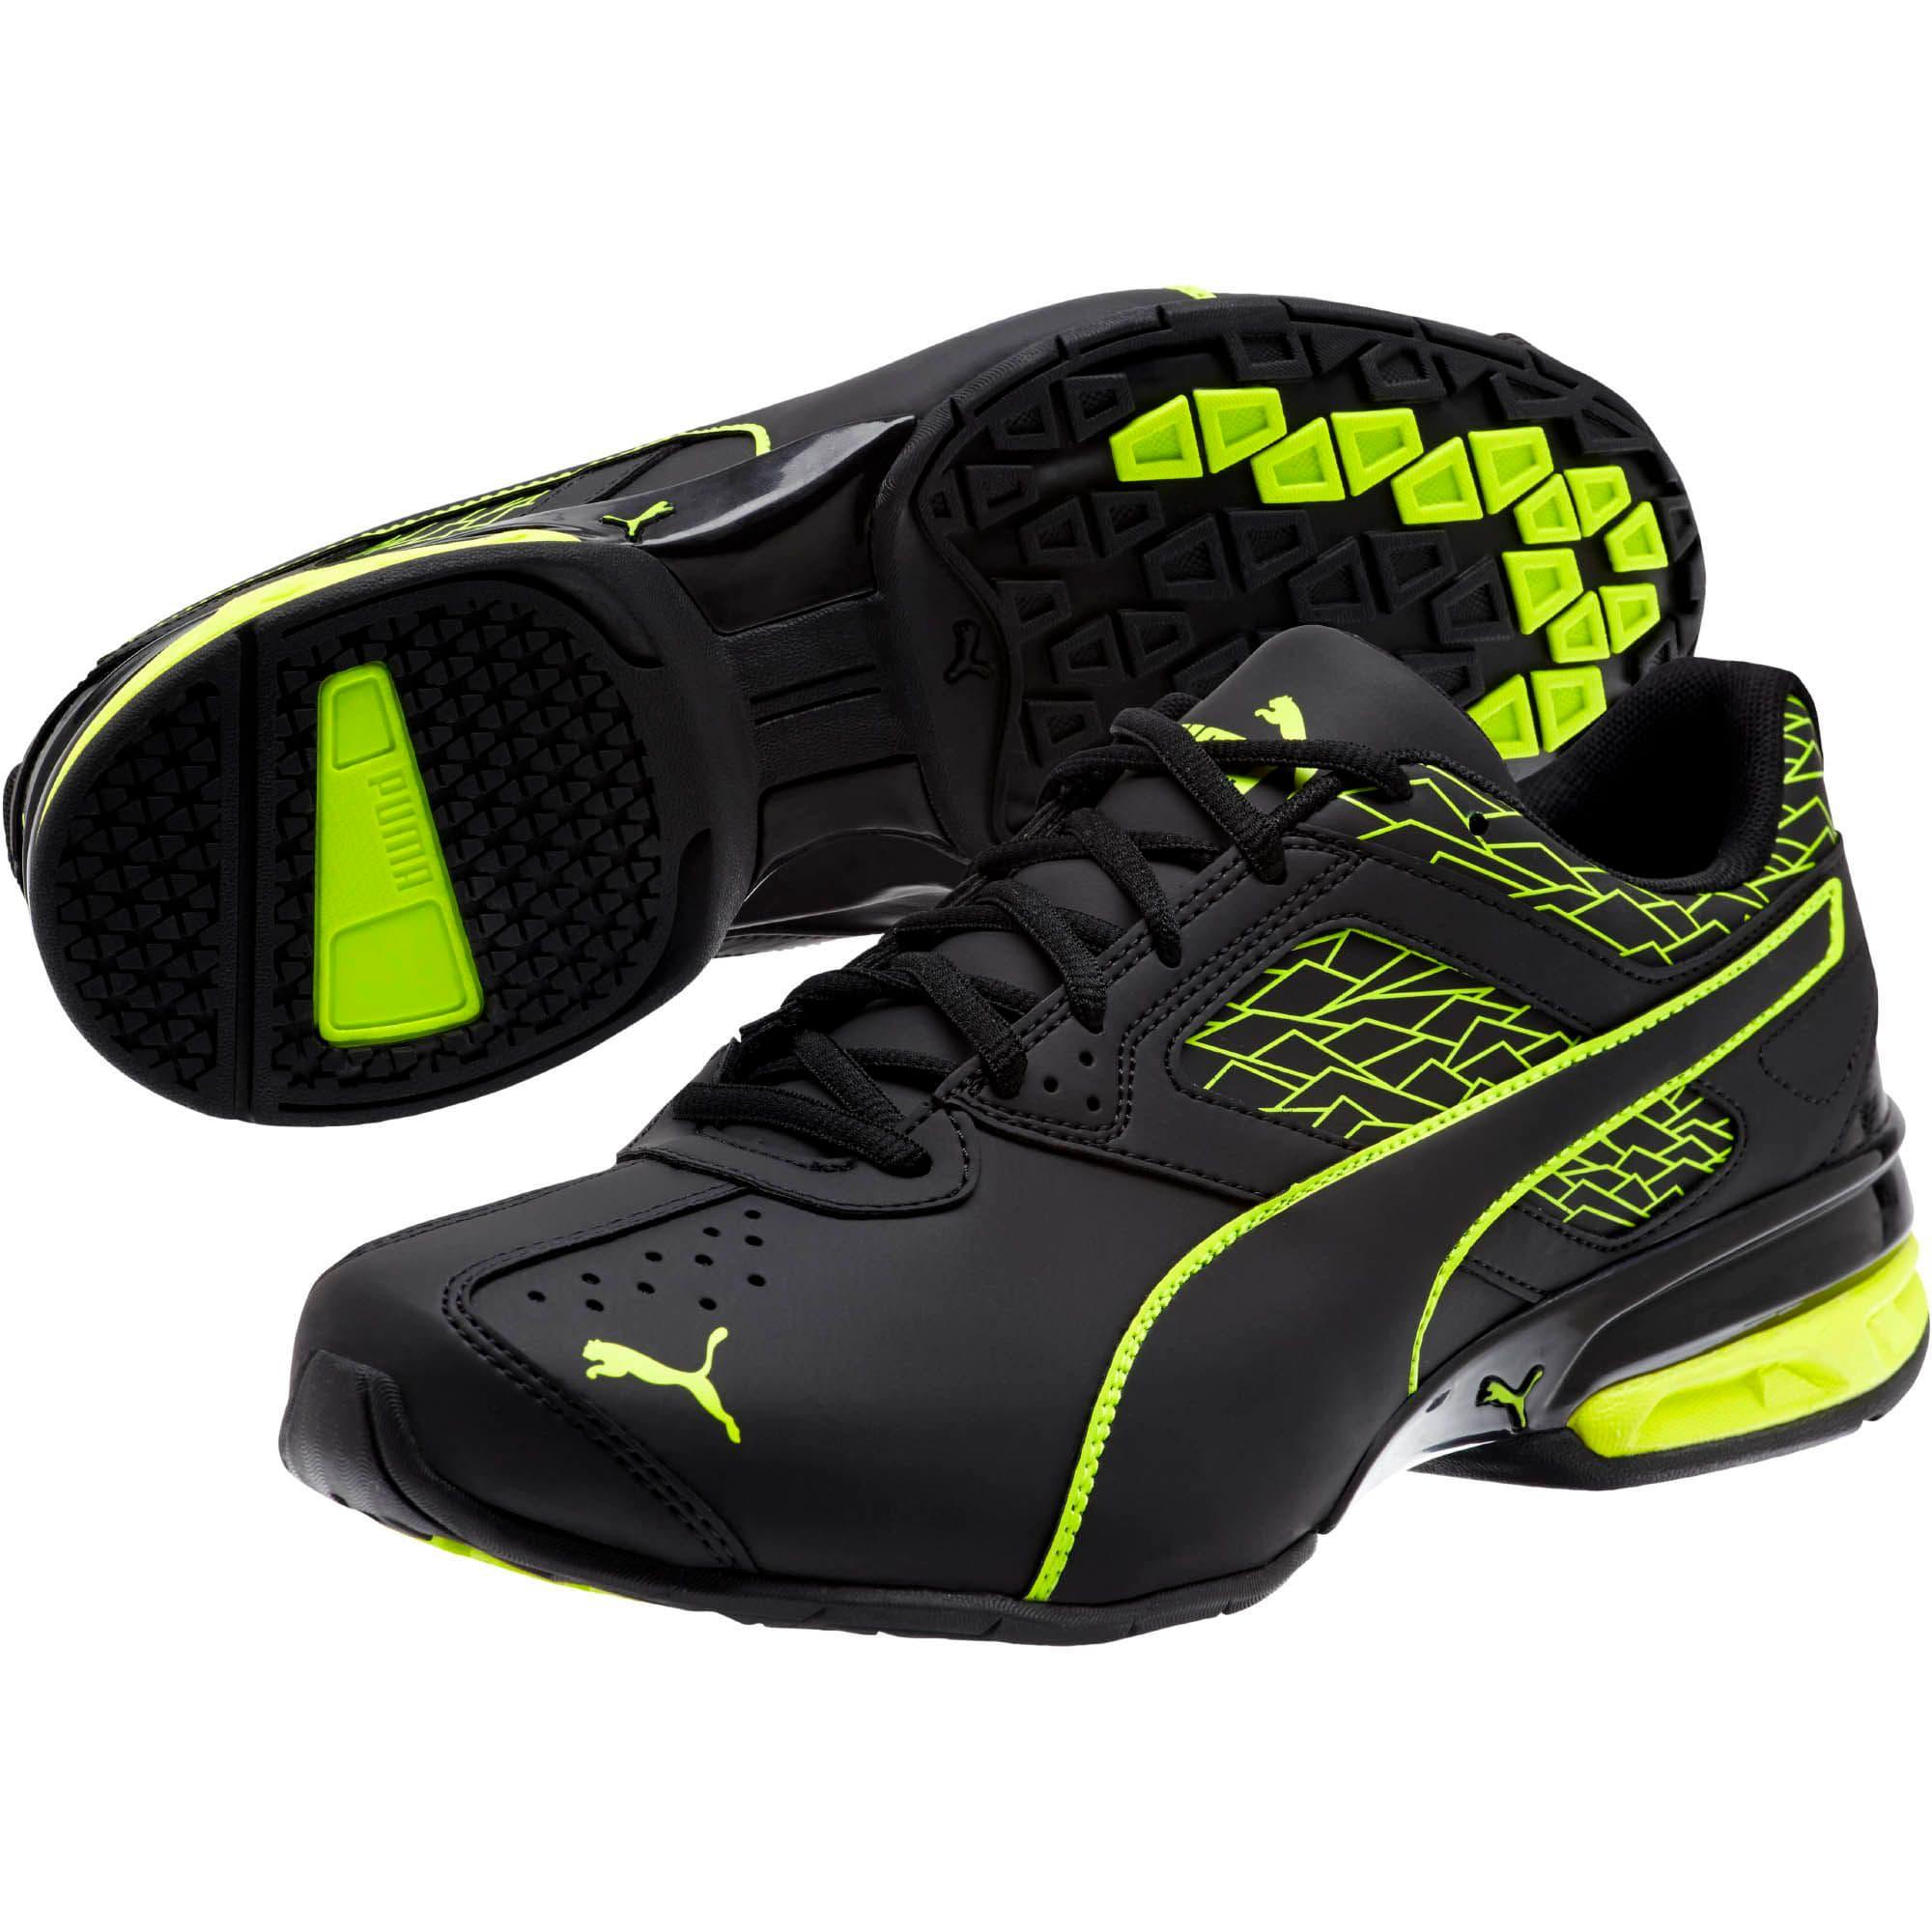 Thumbnail 2 of Tazon 6 Fracture FM Men's Sneakers, Puma Black-Safety Yellow, medium